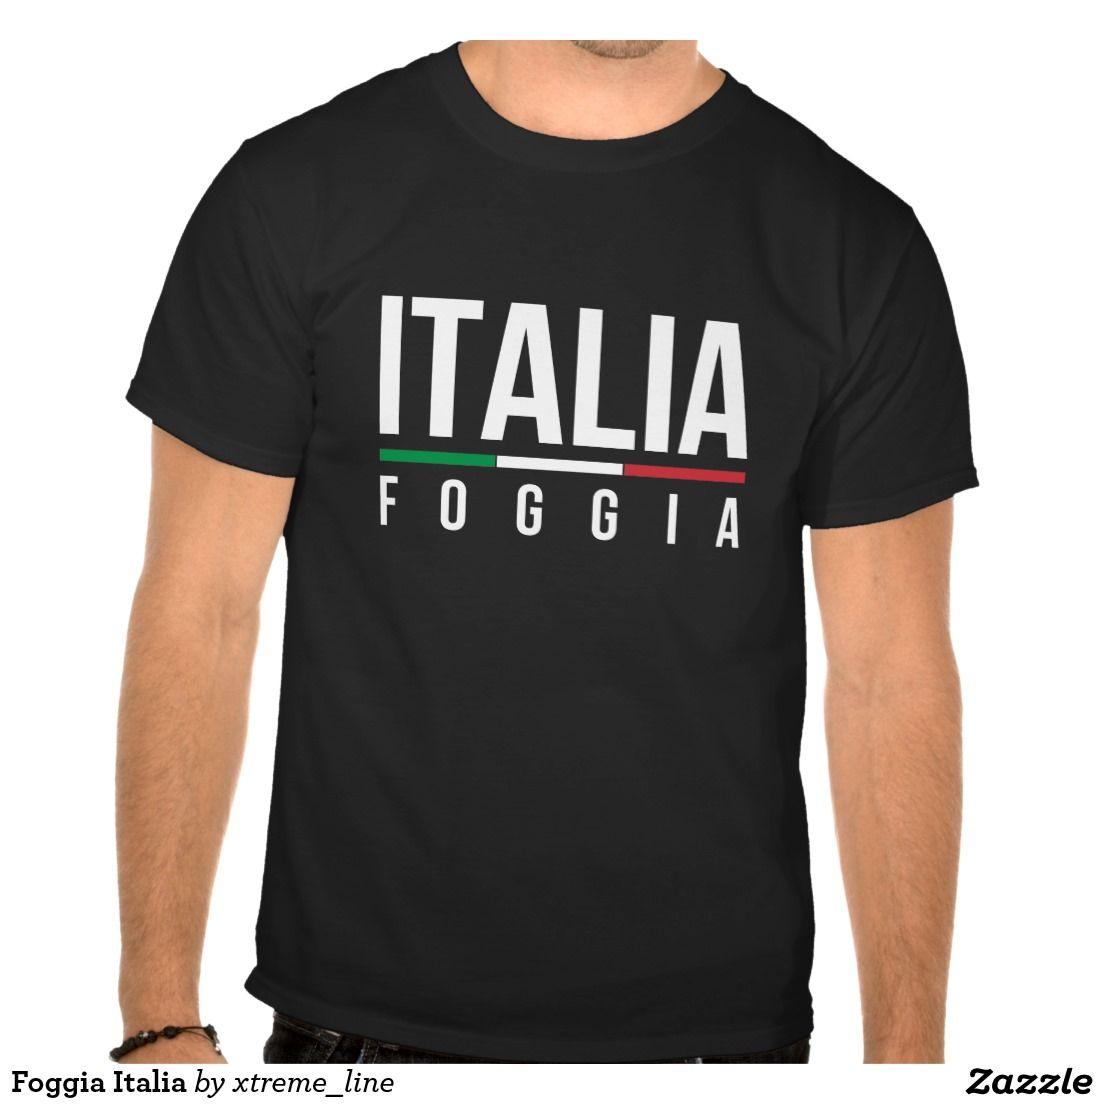 Design t shirt zazzle - Foggia Italia T Shirt Italian Clothing Apparel